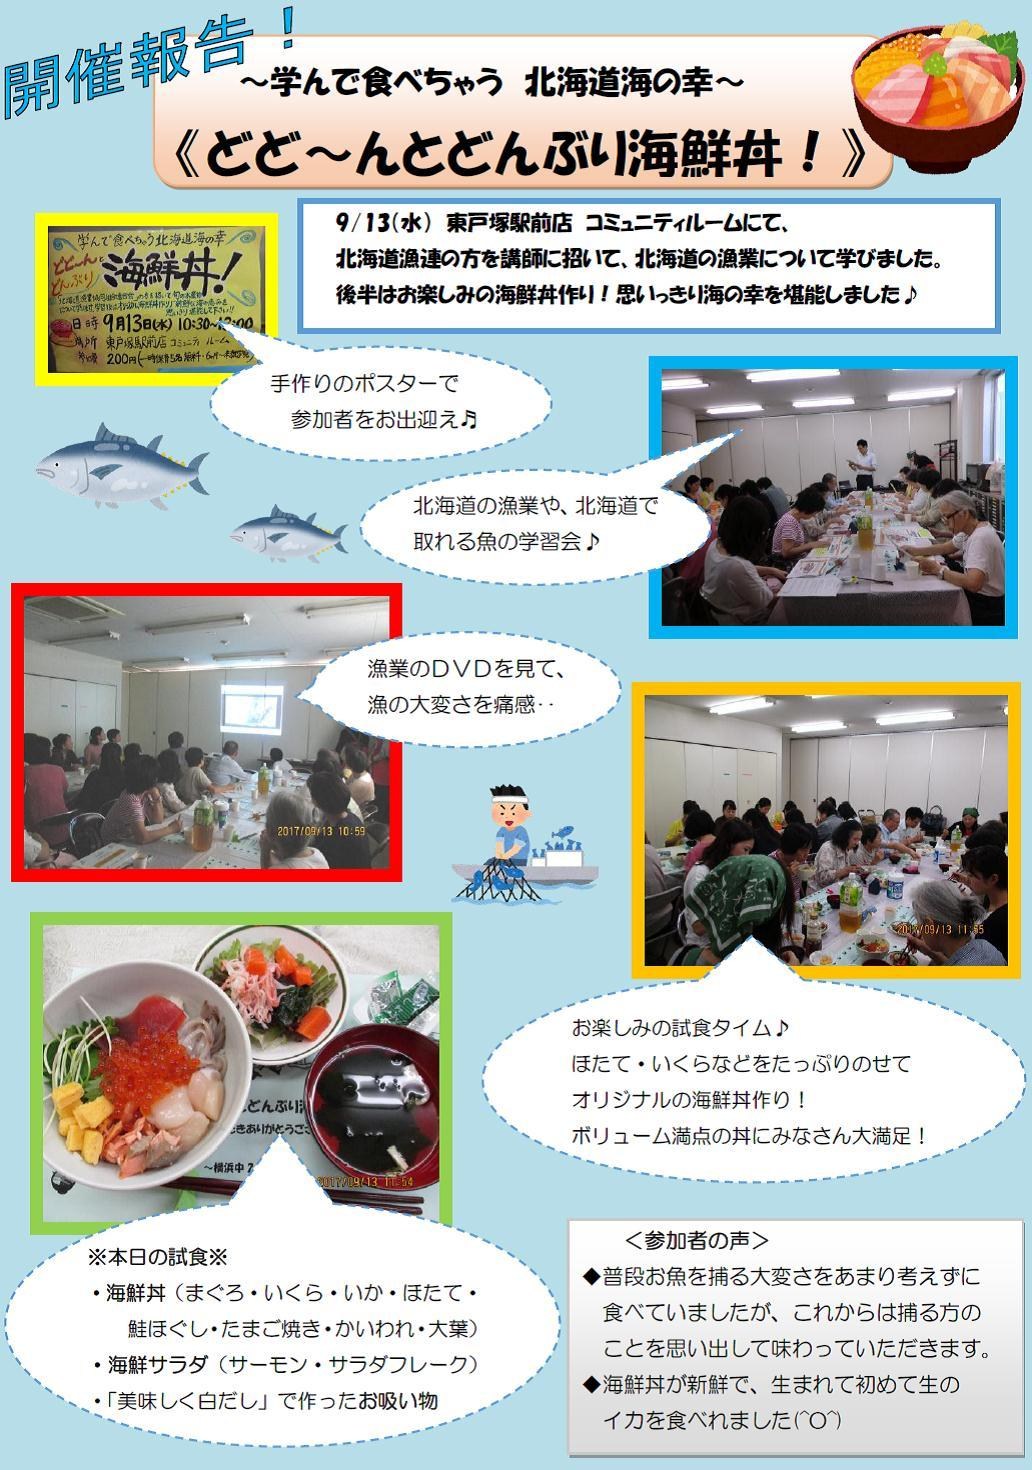 http://kanagawa.ucoop.or.jp/hiroba/areanews/files/naka2%2020170913.jpg